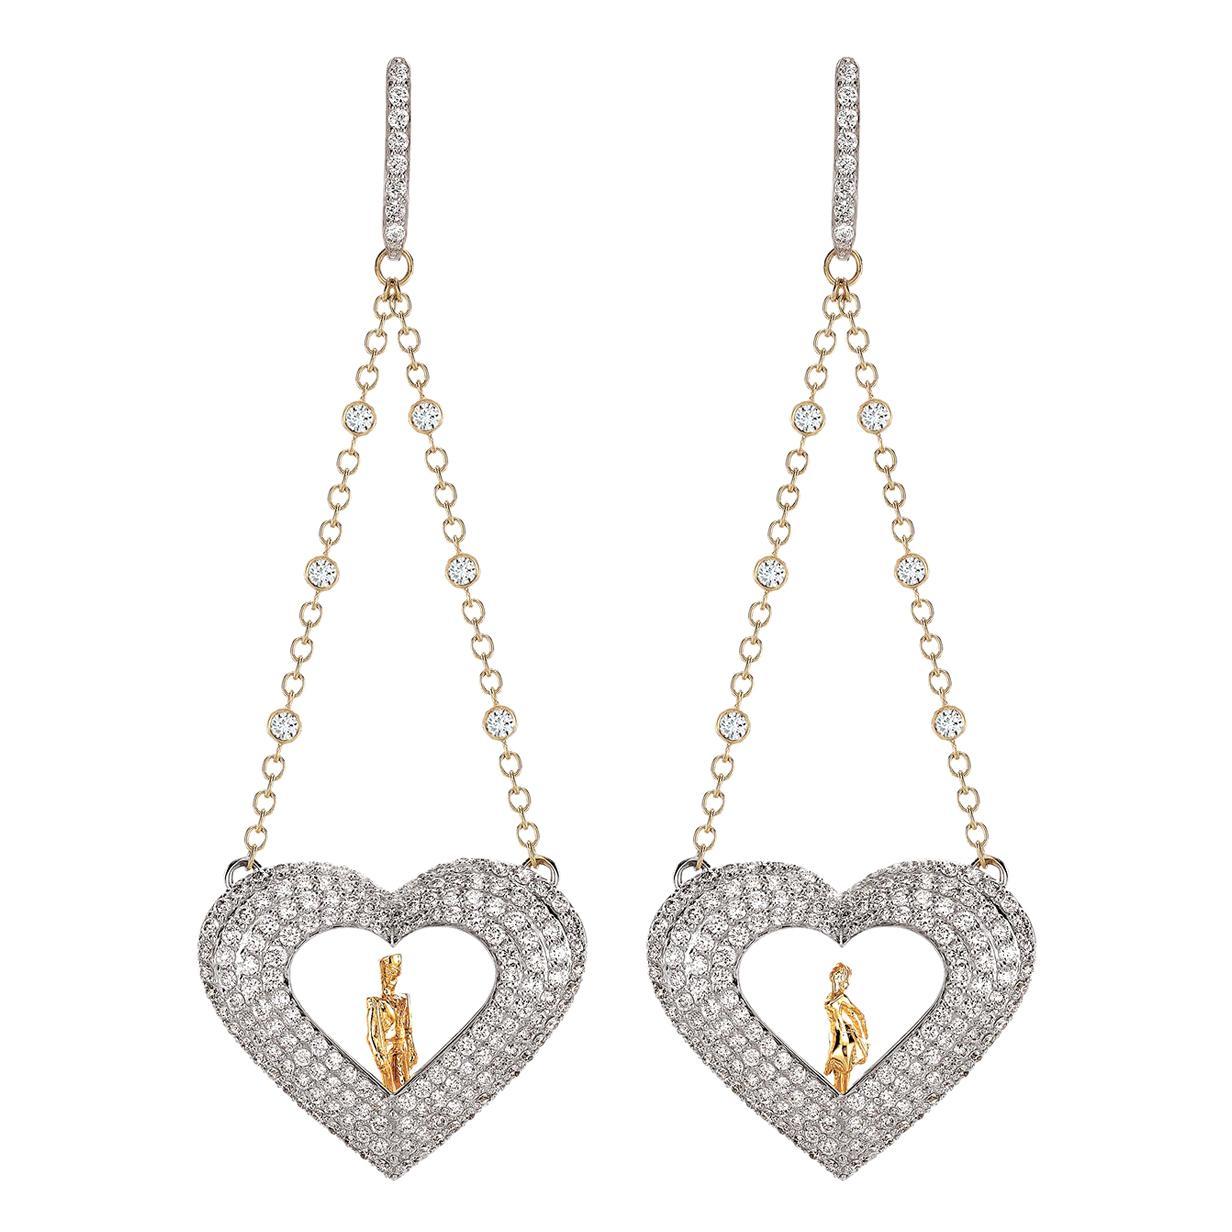 Sybarite Jewellery Hearts 18 Karat Gold Diamond Dangling Earrings